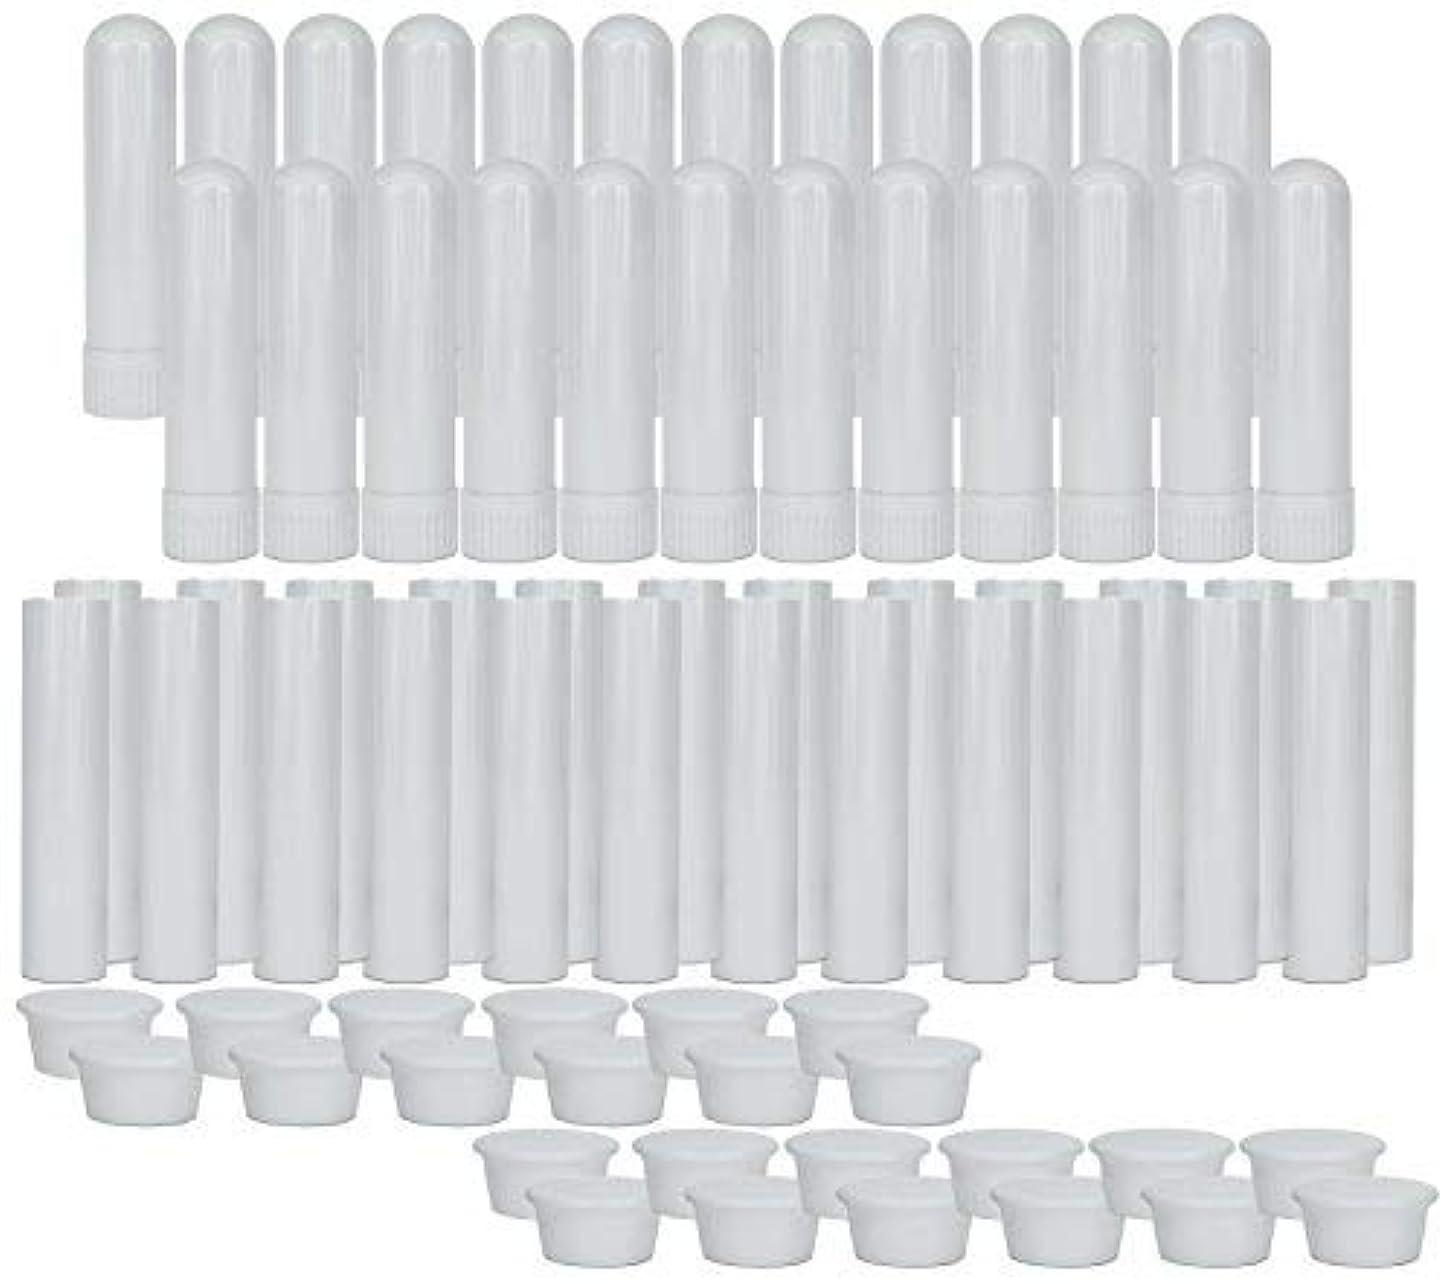 農業彼女写真のEssential Oil Aromatherapy Blank Nasal Inhaler Tubes (24 Complete Sticks), Empty Nasal Inhalers for Essential...